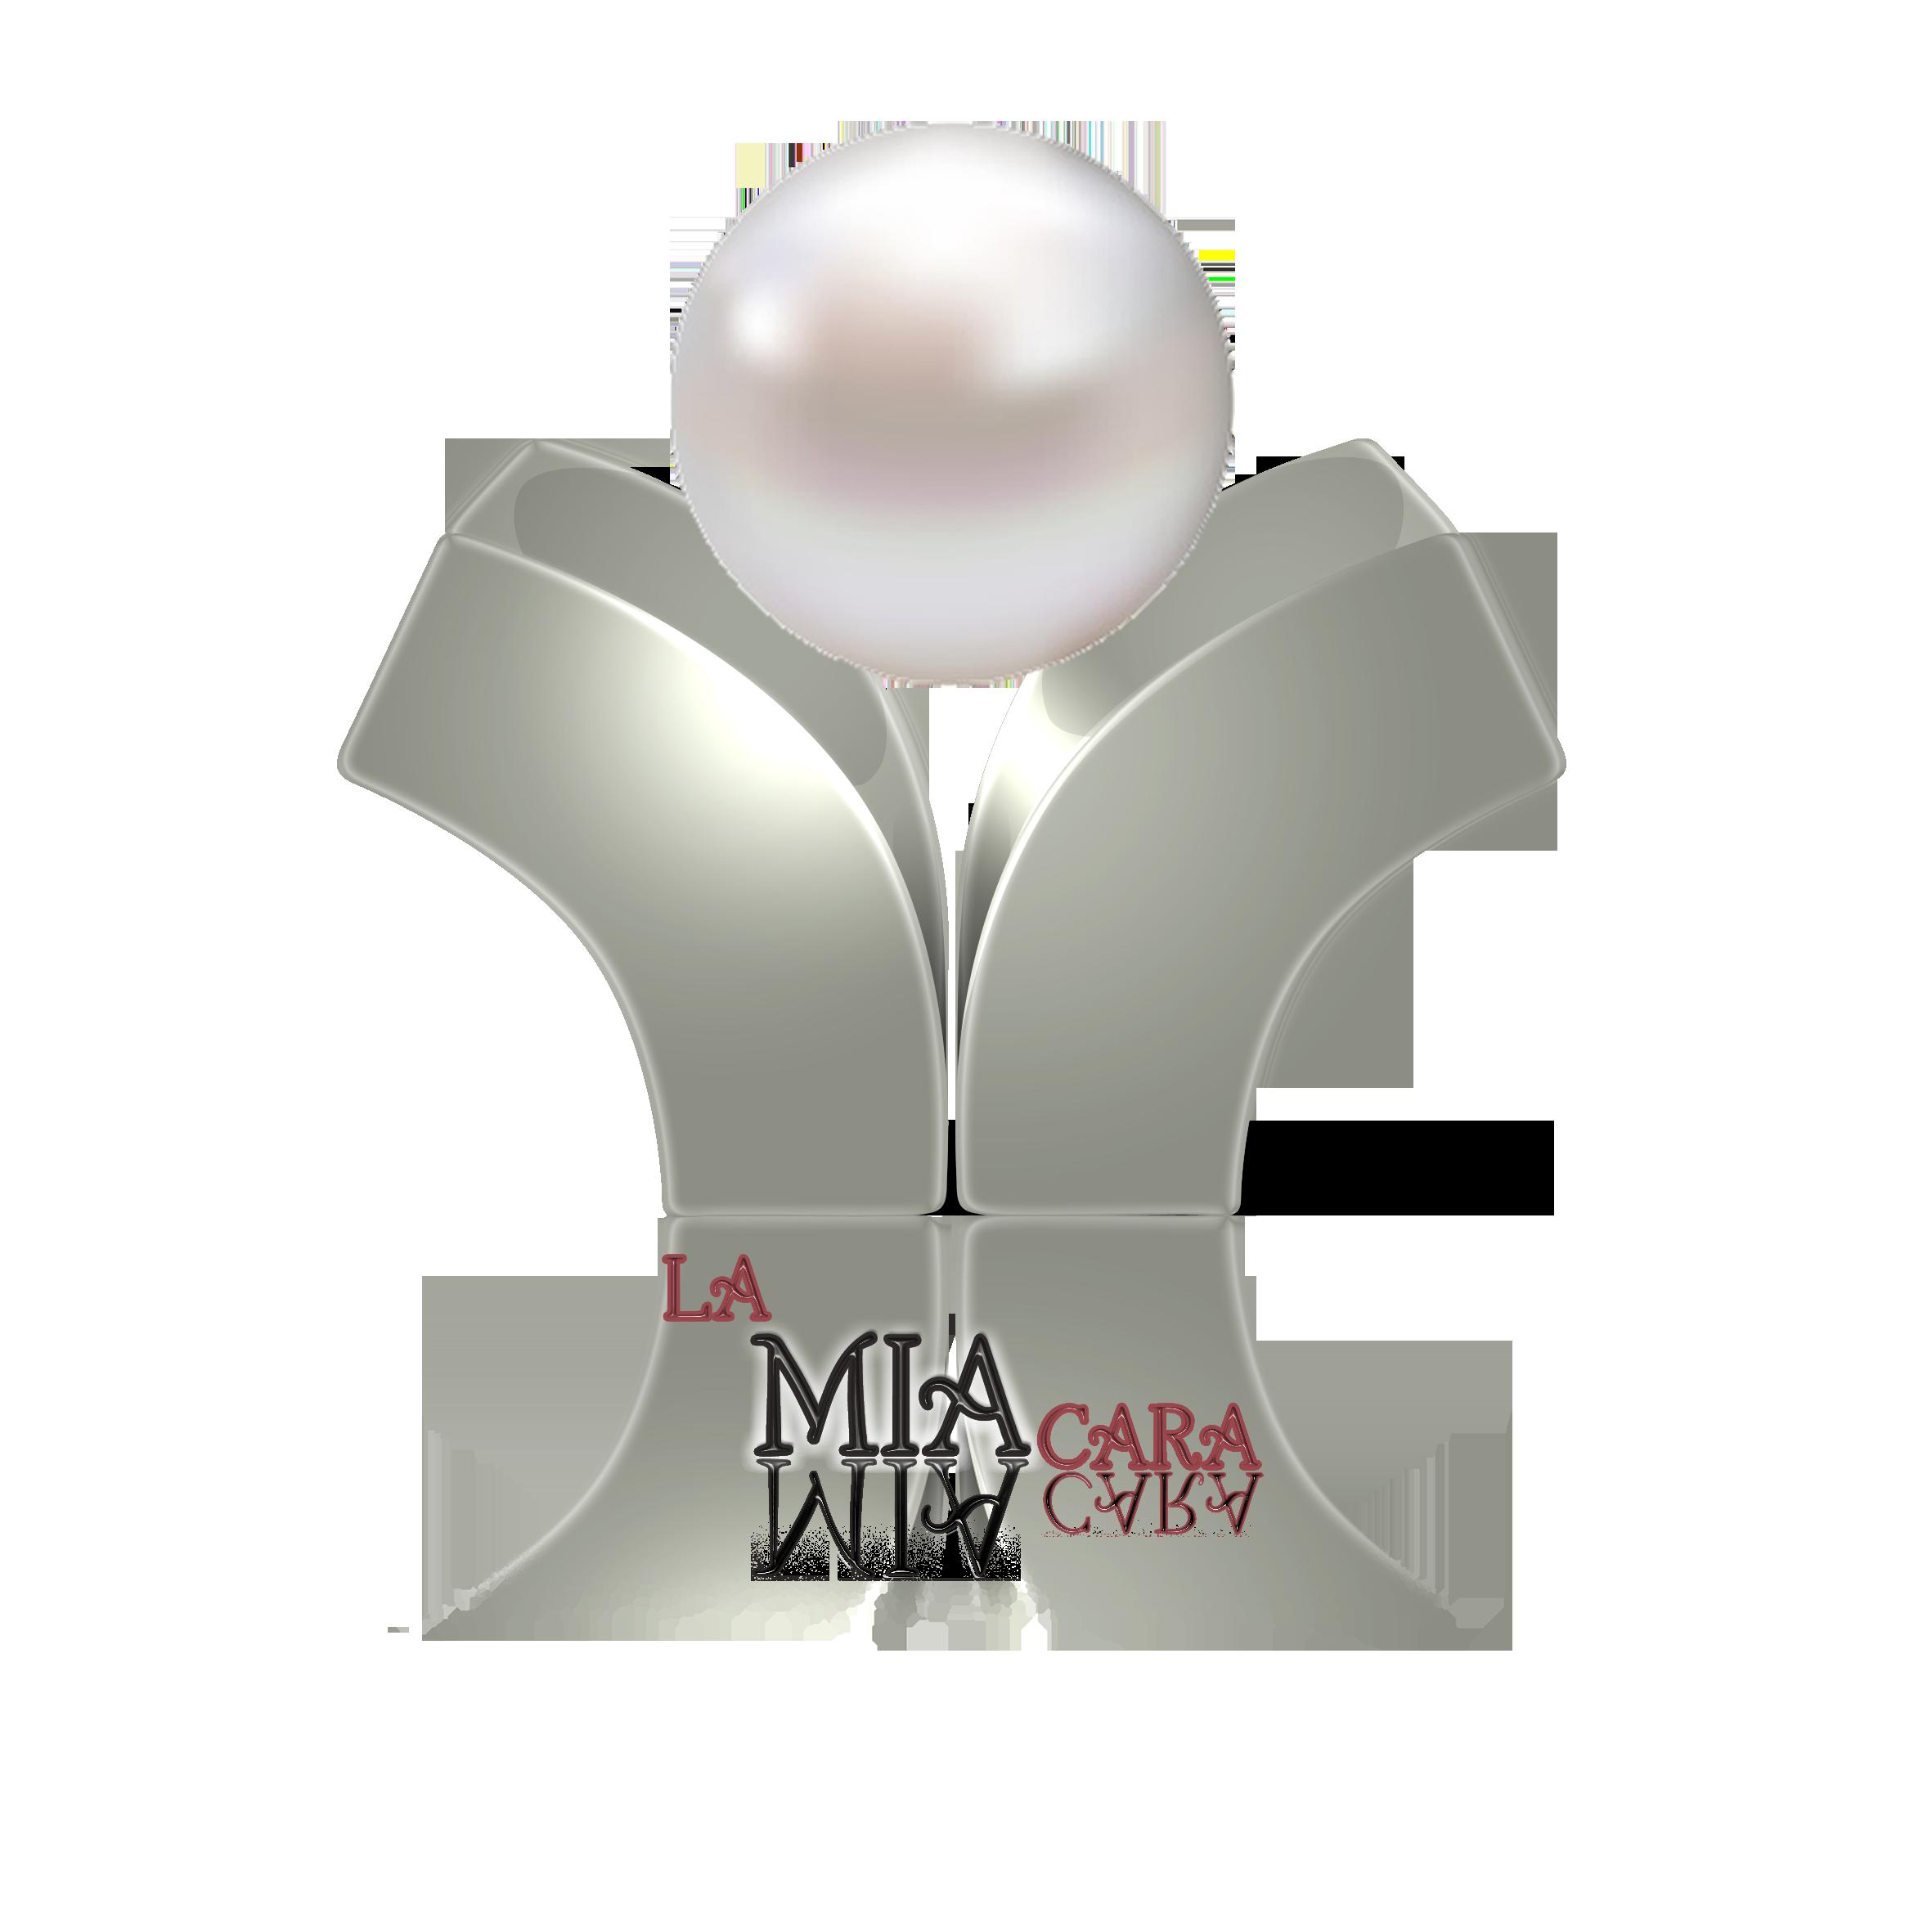 La Mia Cara Jewelry & Accessories lamiacara.com/  #fashionjewelry #costumejewelry #jewelry #promjewelry #italianjewelry